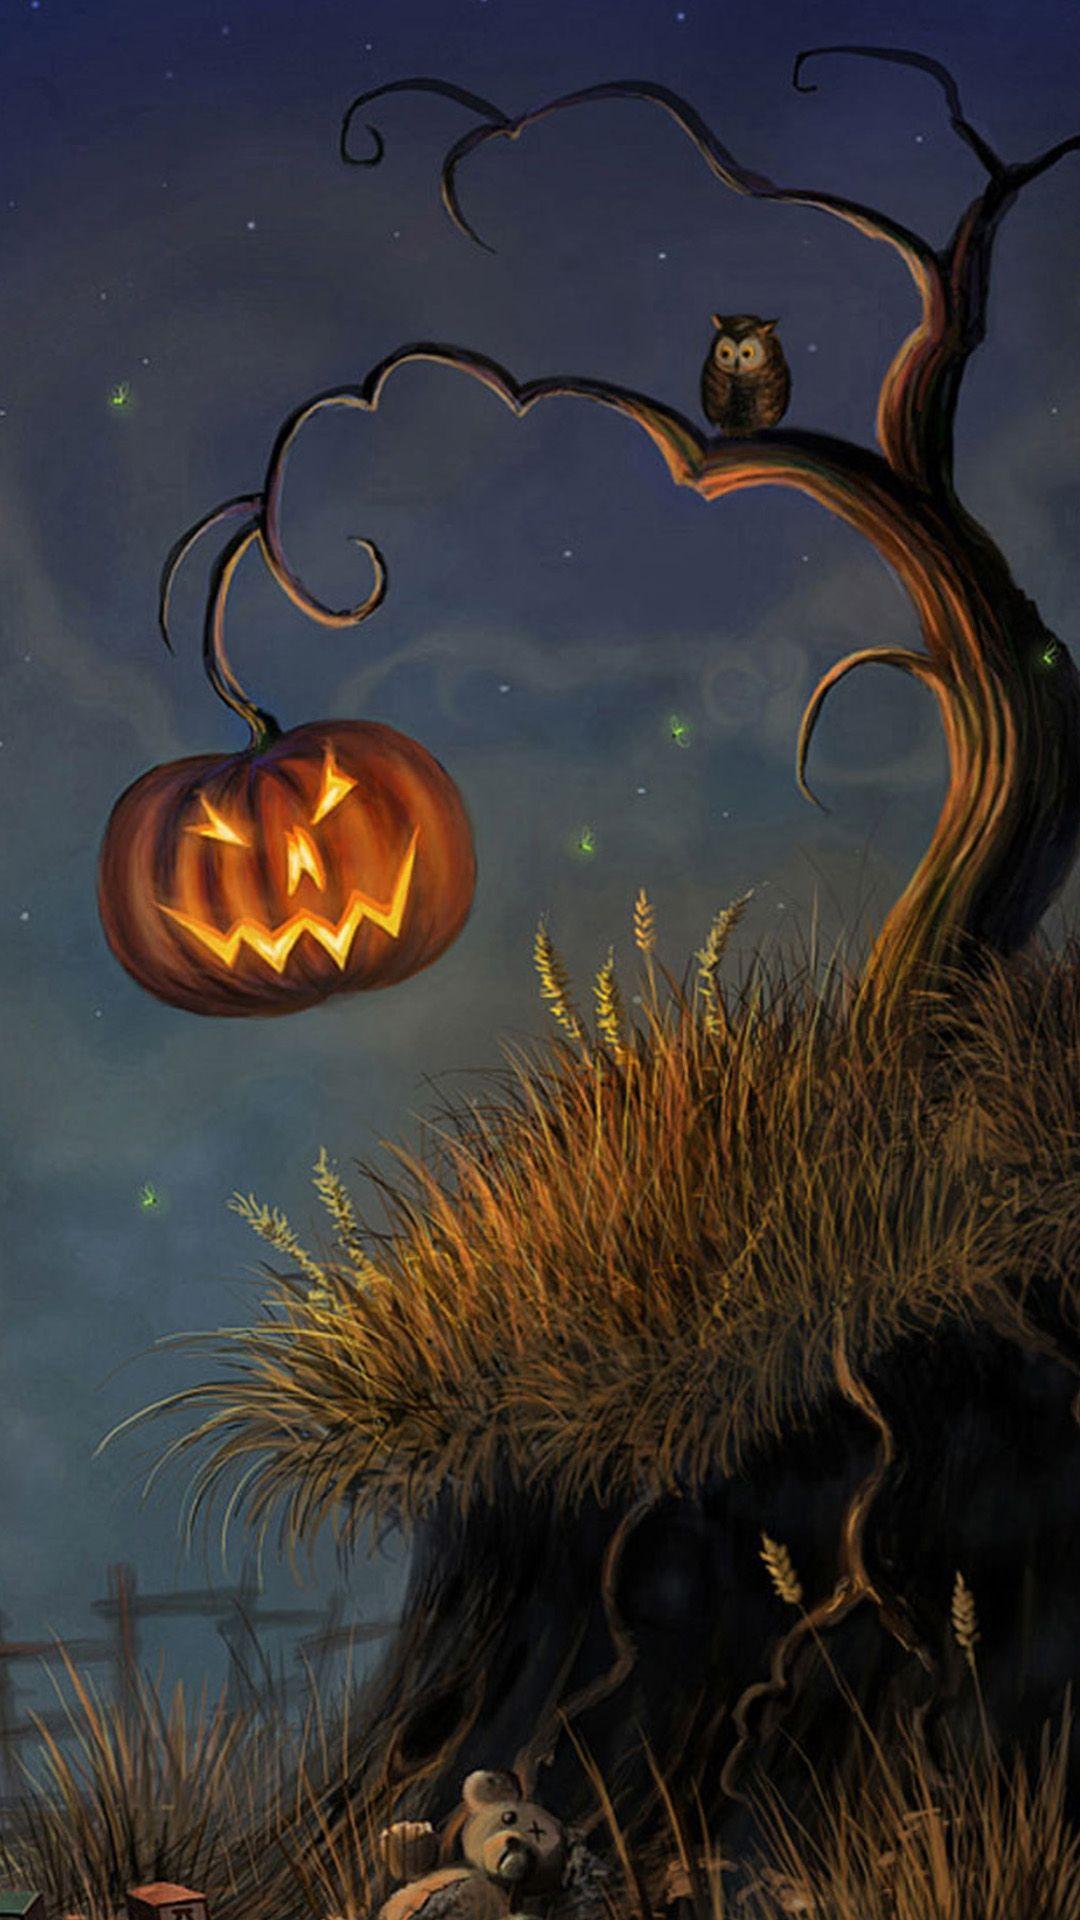 Good Wallpaper Halloween Pinterest - 7b080b7b12d0fe96f4550a2b8e99d081  You Should Have_98135.jpg